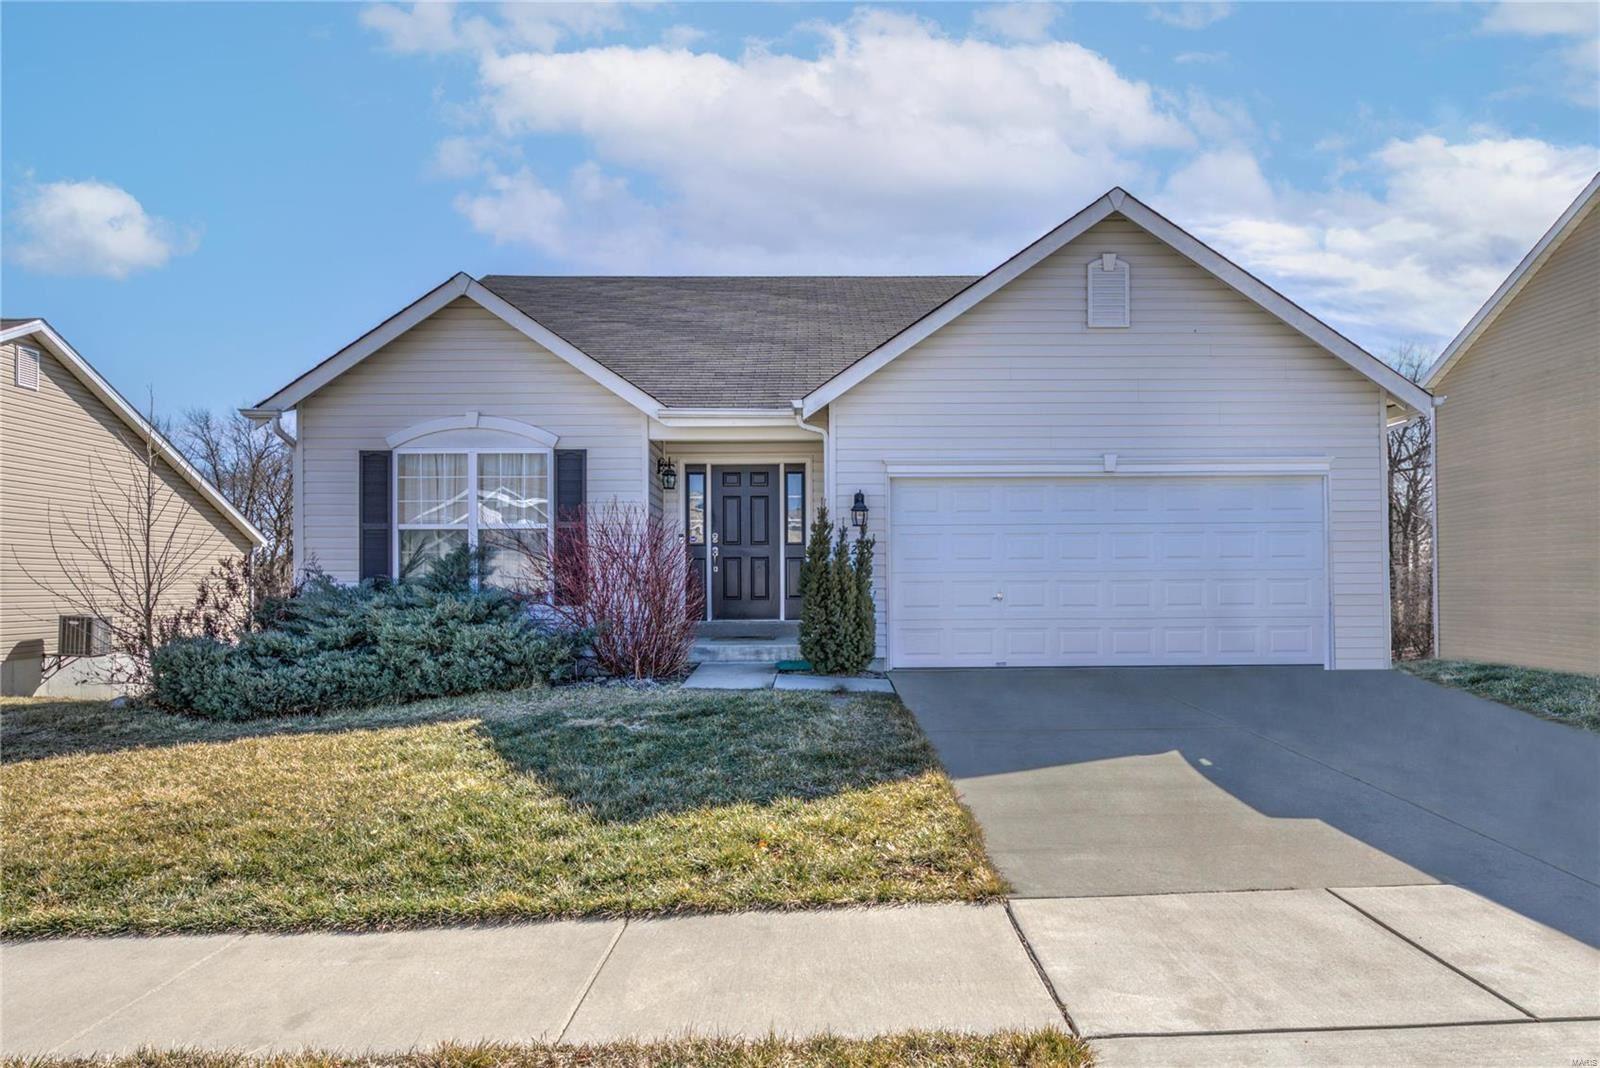 293 Sonnet Circle, Wentzville, MO 63385 - MLS#: 21012212